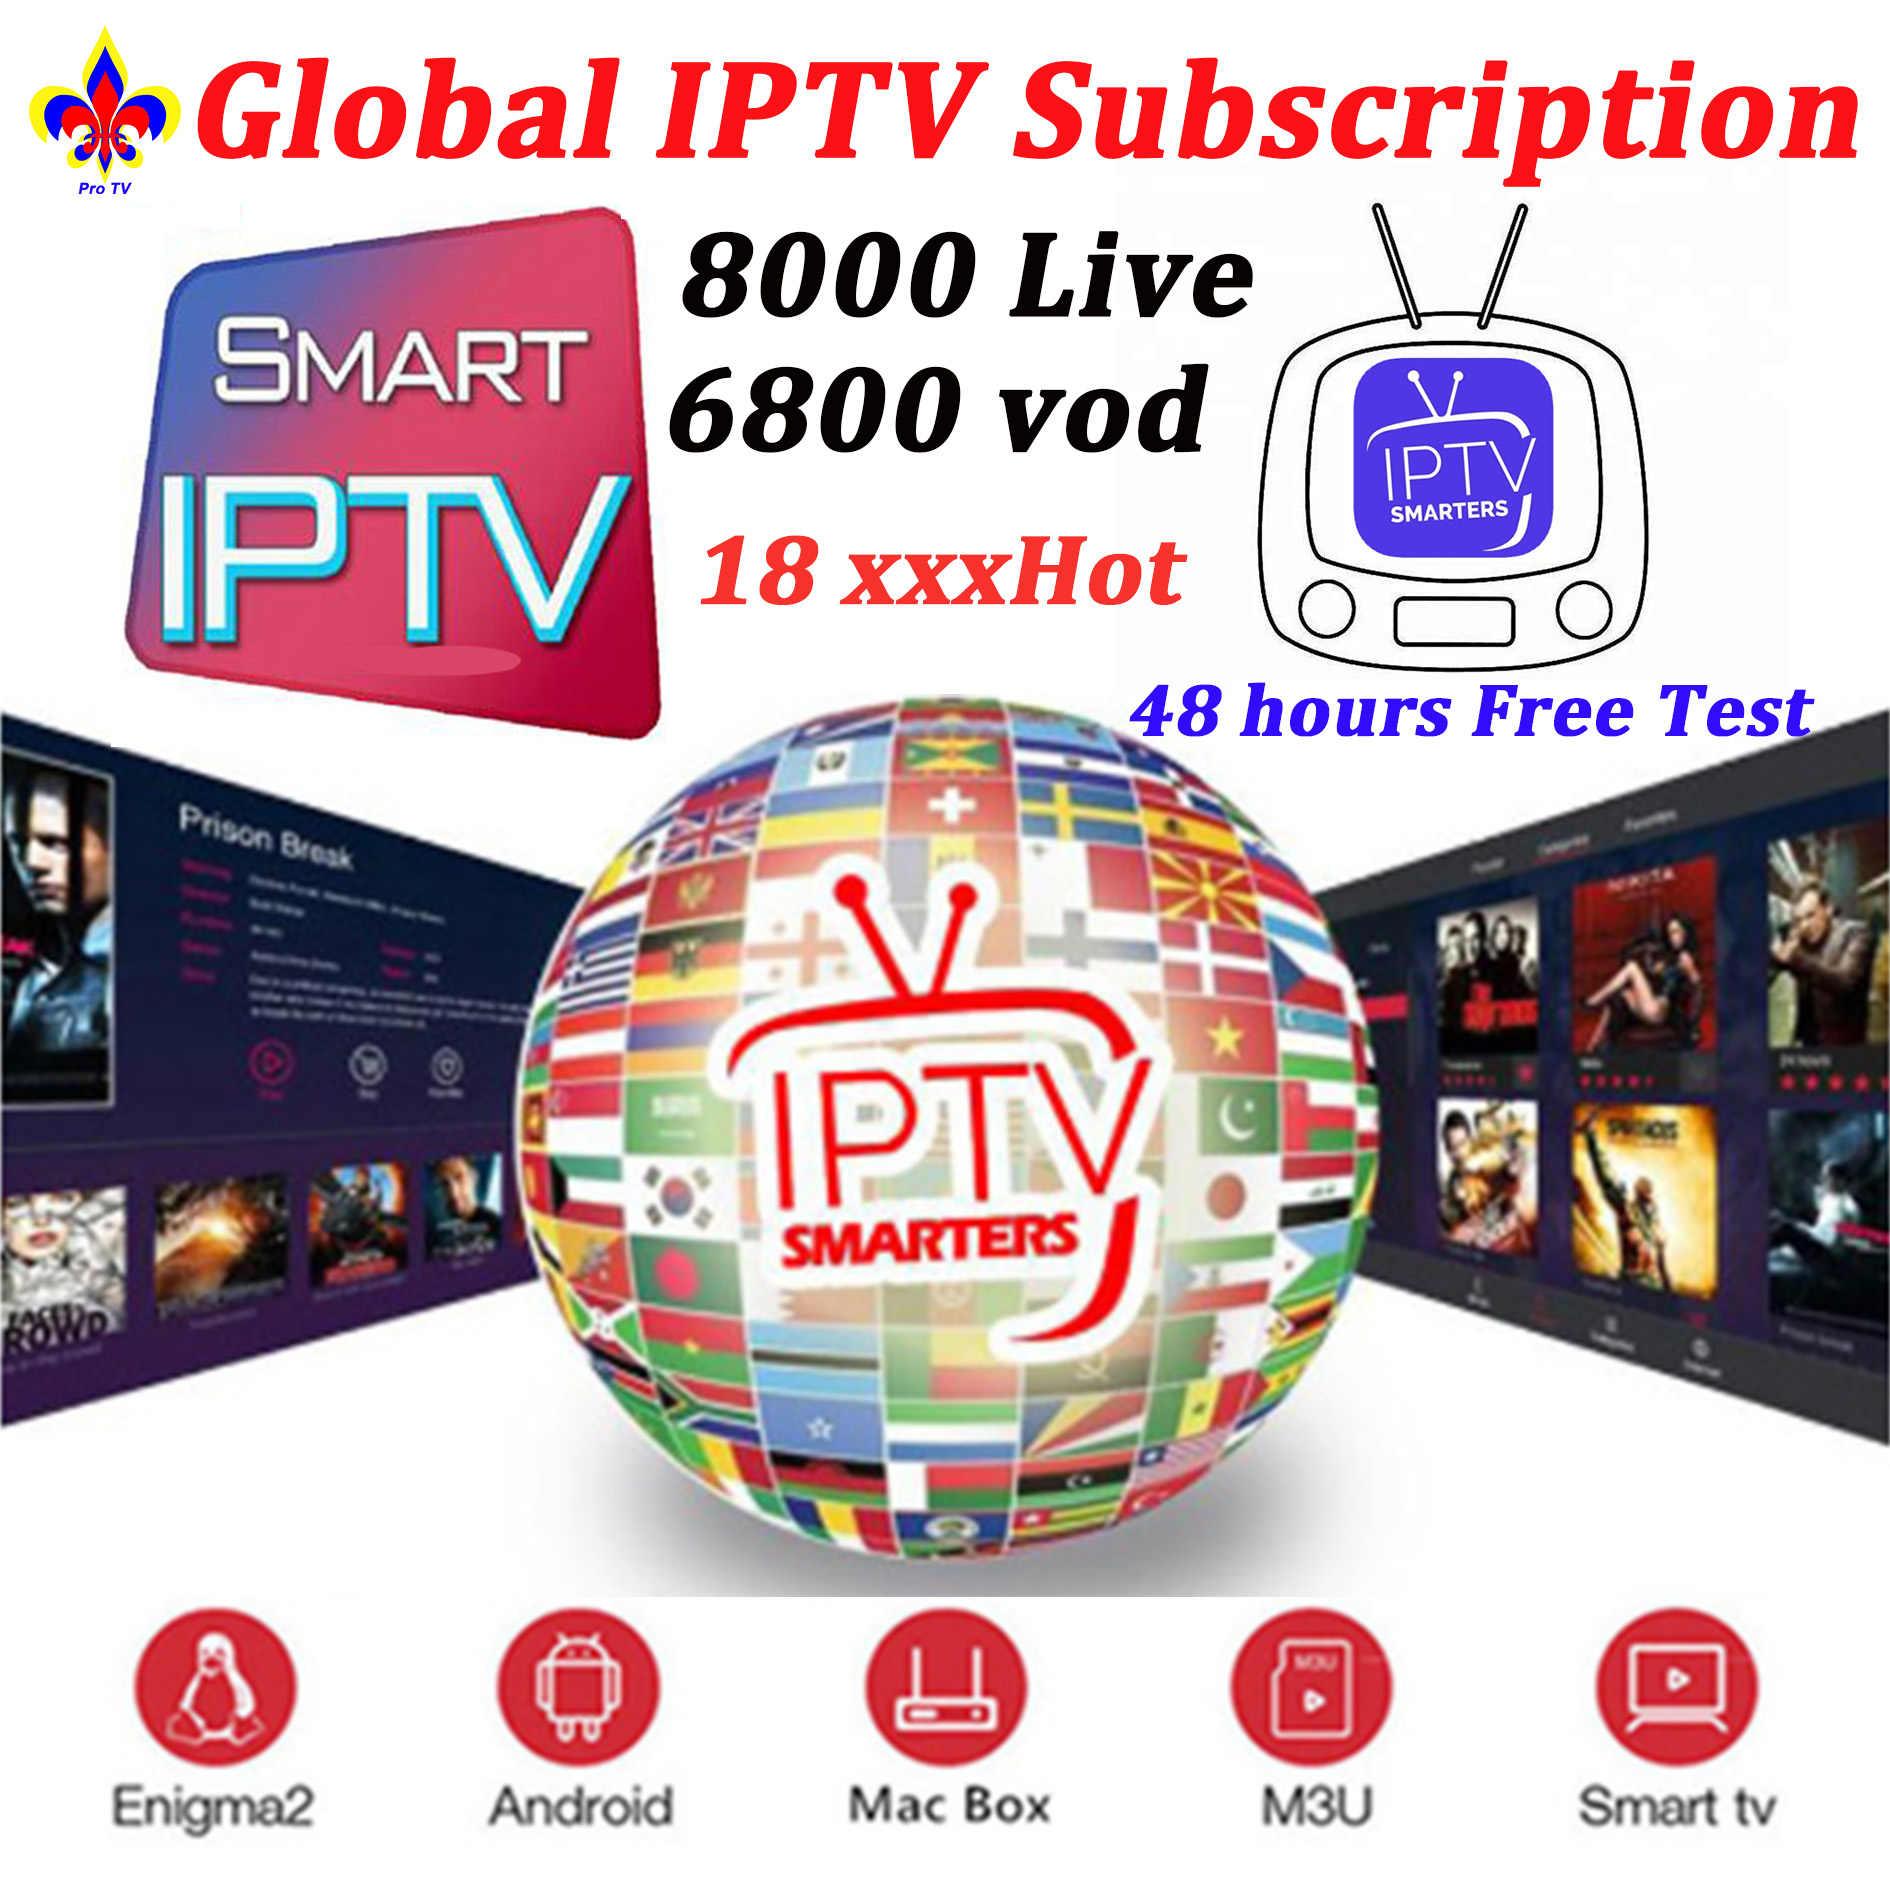 Monde IPTV M3u abonnement 8000 en direct et vod Iptv Europe Mediaset allemand Premium M3U Vlc pour Android Box Enigma2 Smart TV PC